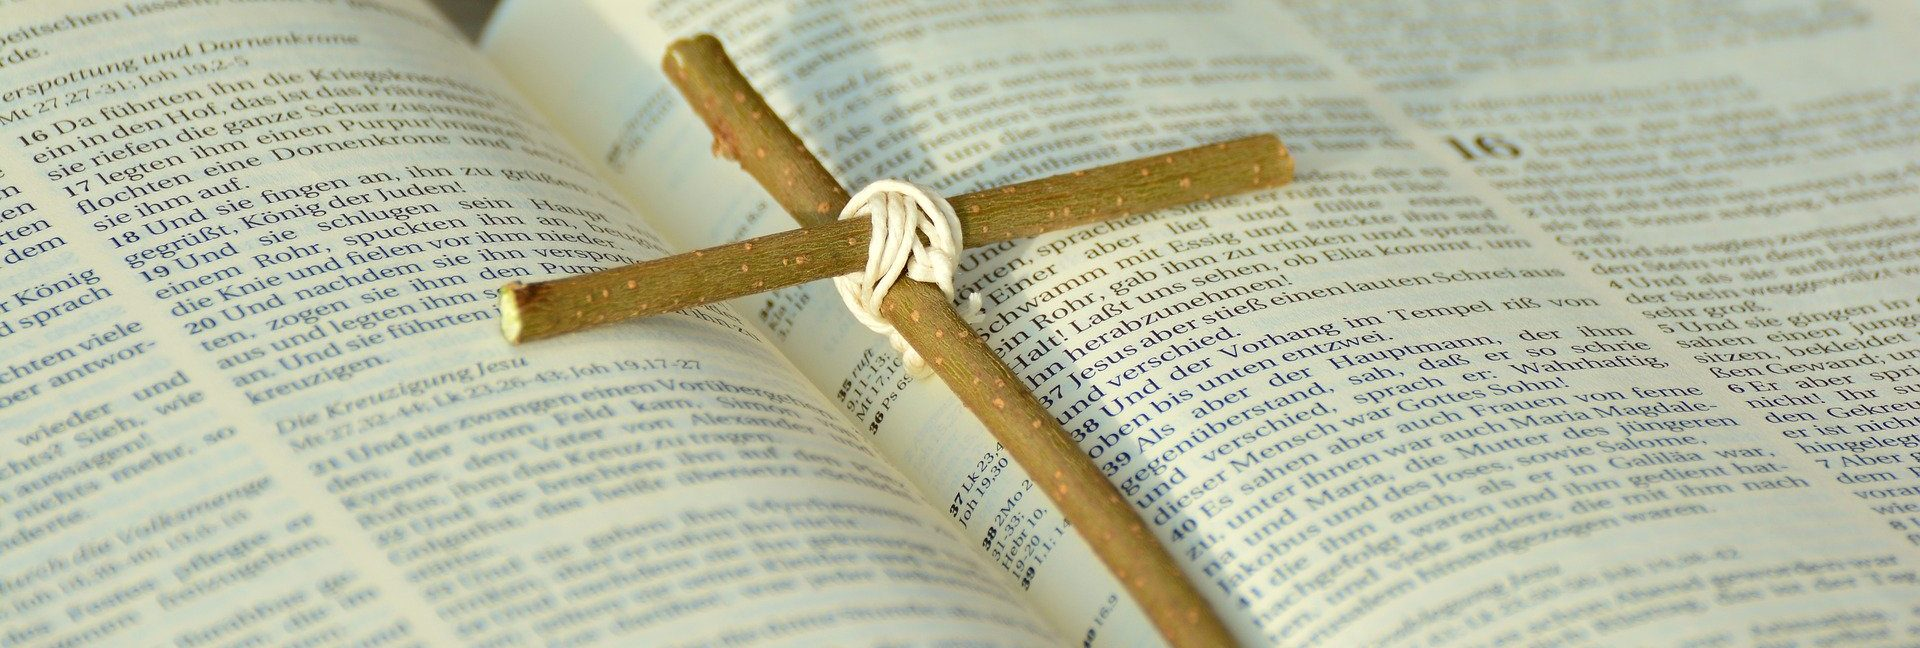 bibel und kreuz